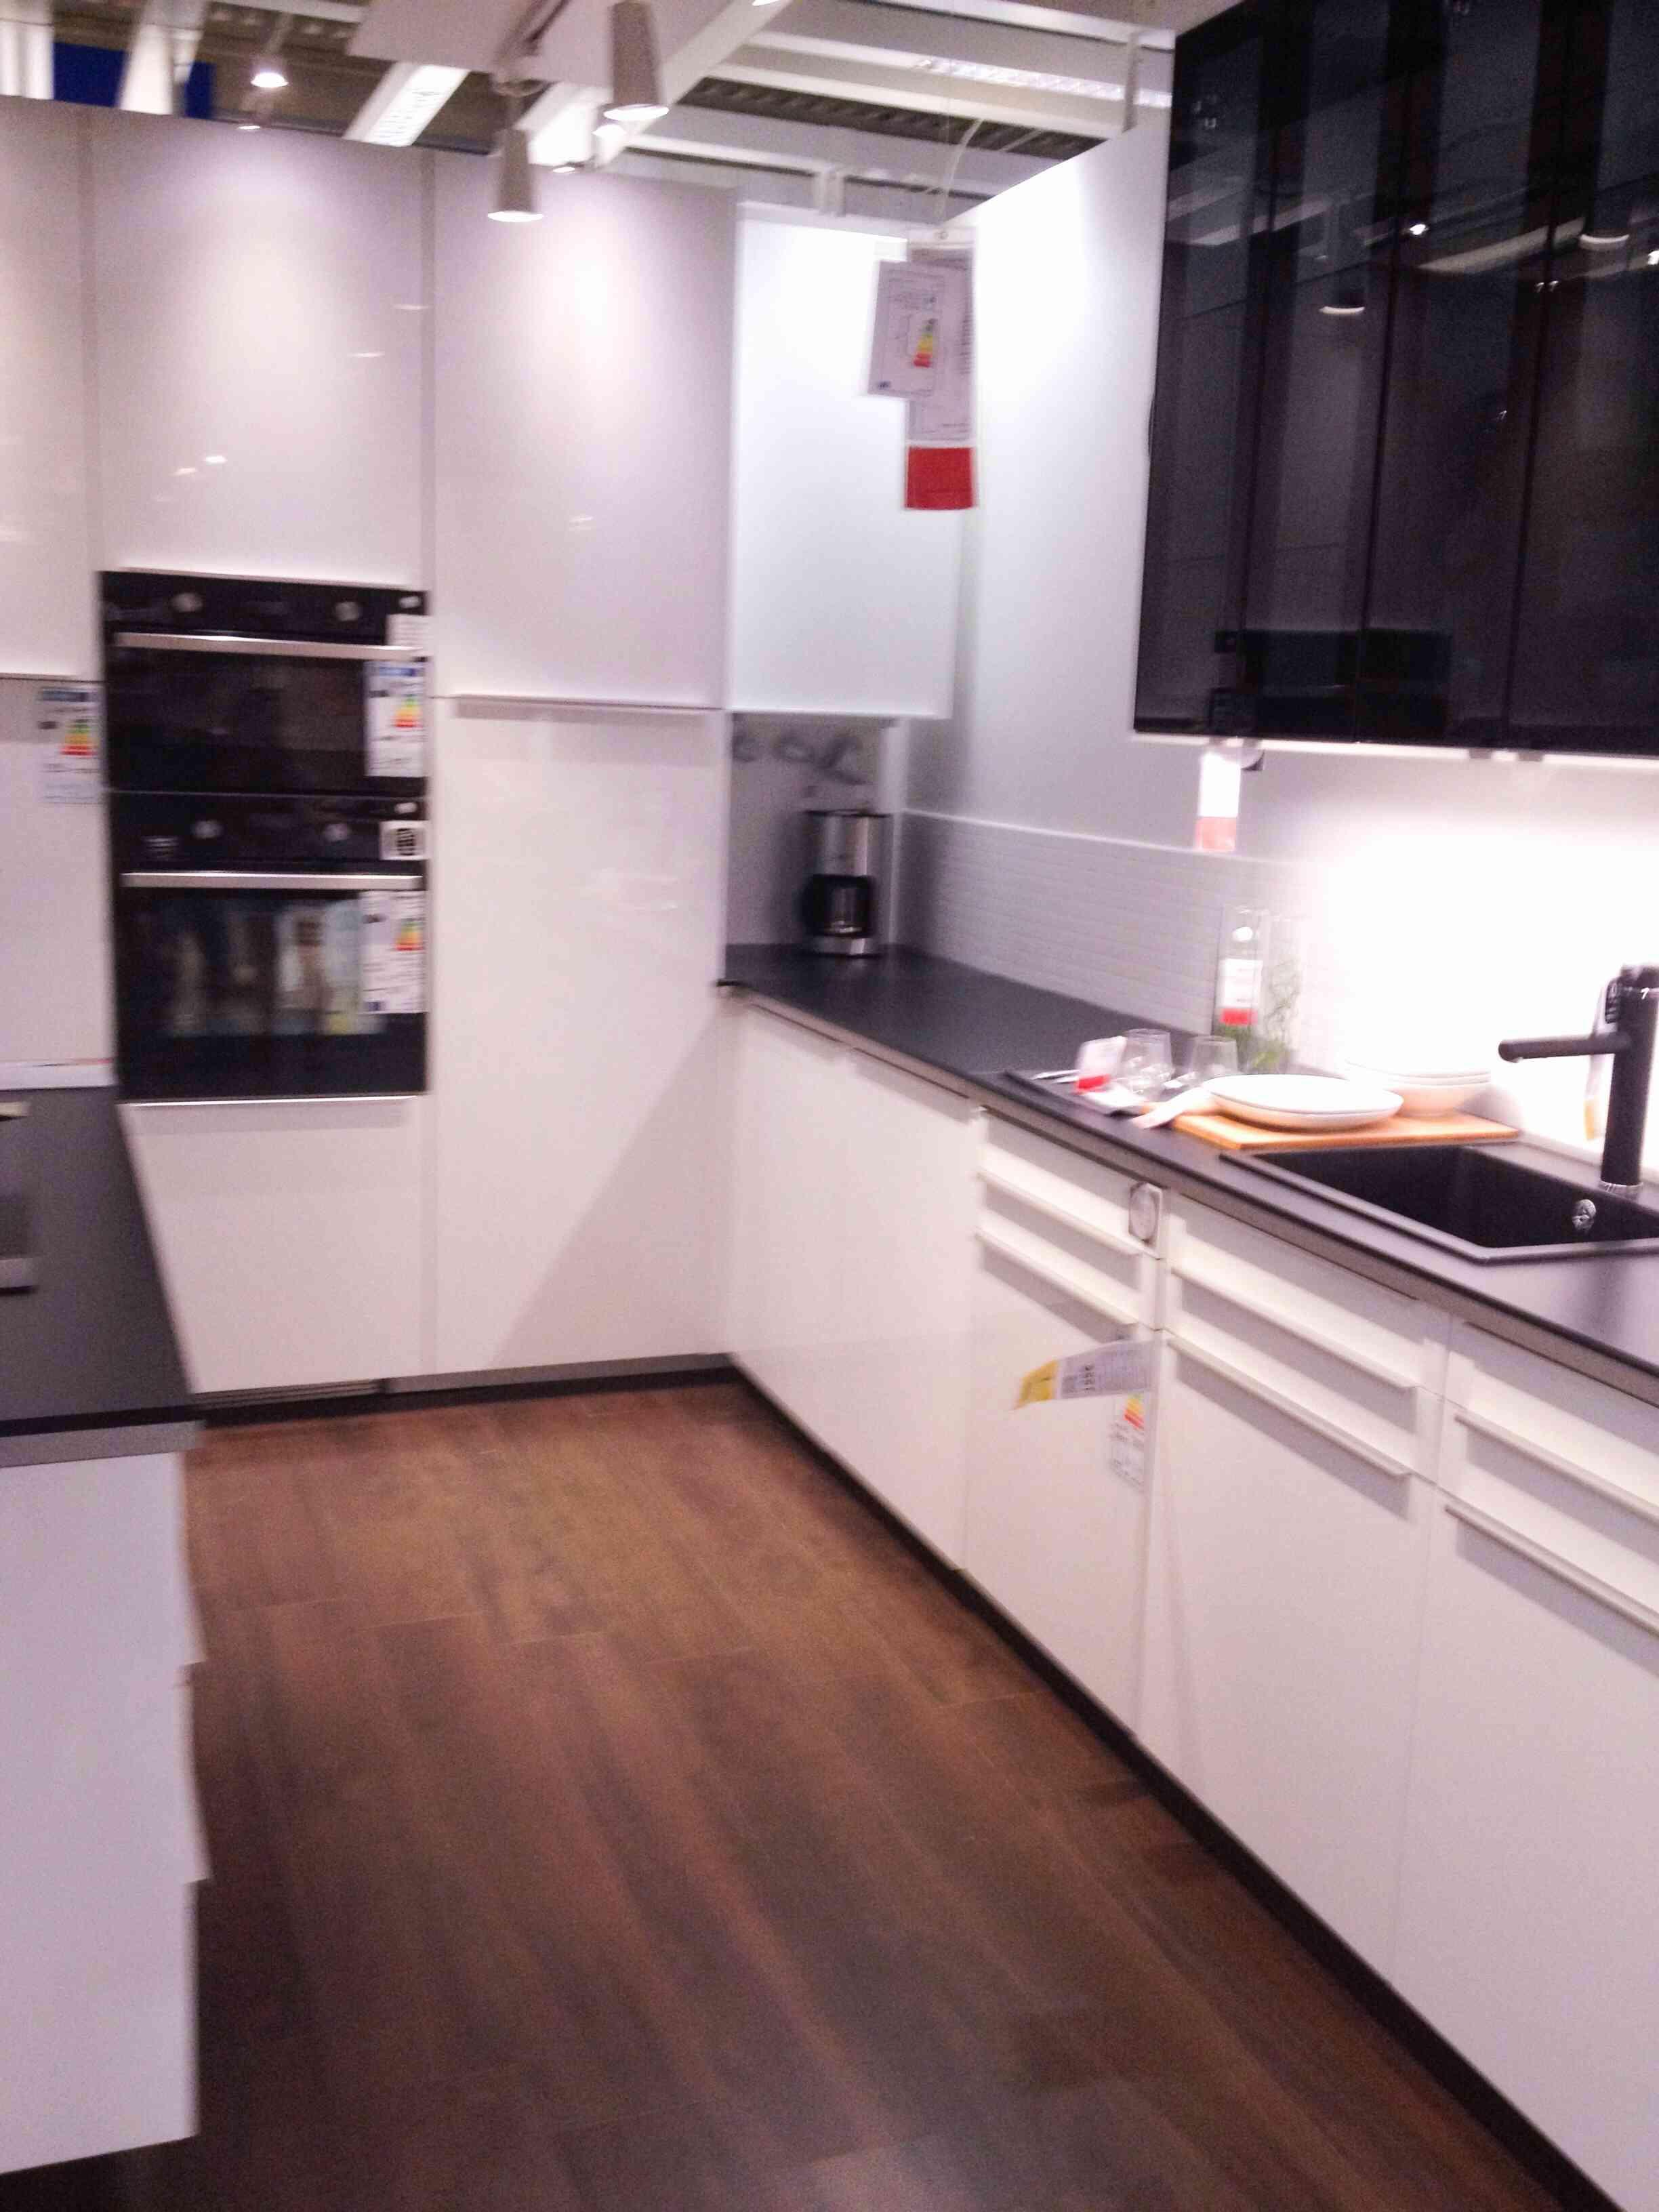 simulateur cuisine but inspirant galerie simulateur cuisine but impressionnant tonn simulateur. Black Bedroom Furniture Sets. Home Design Ideas